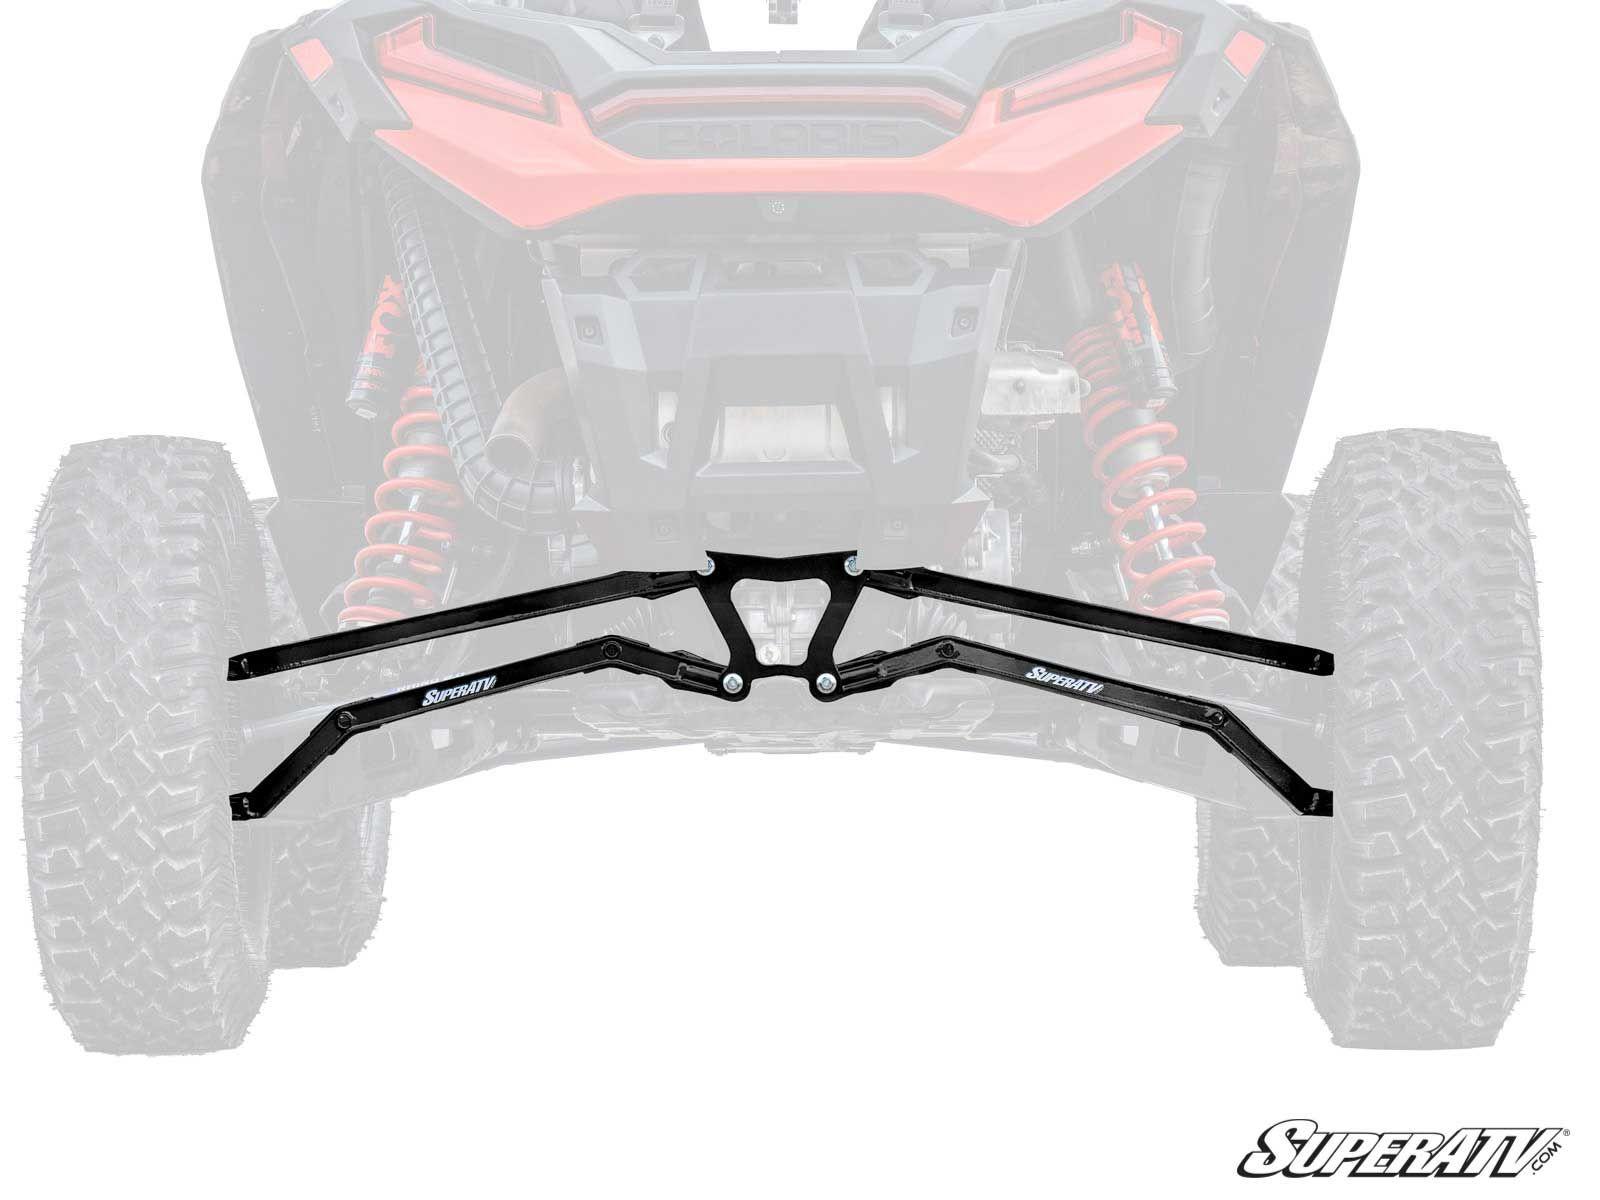 Super ATV High Clearance Boxed Radius Arms for Polaris RZR XP Turbo S